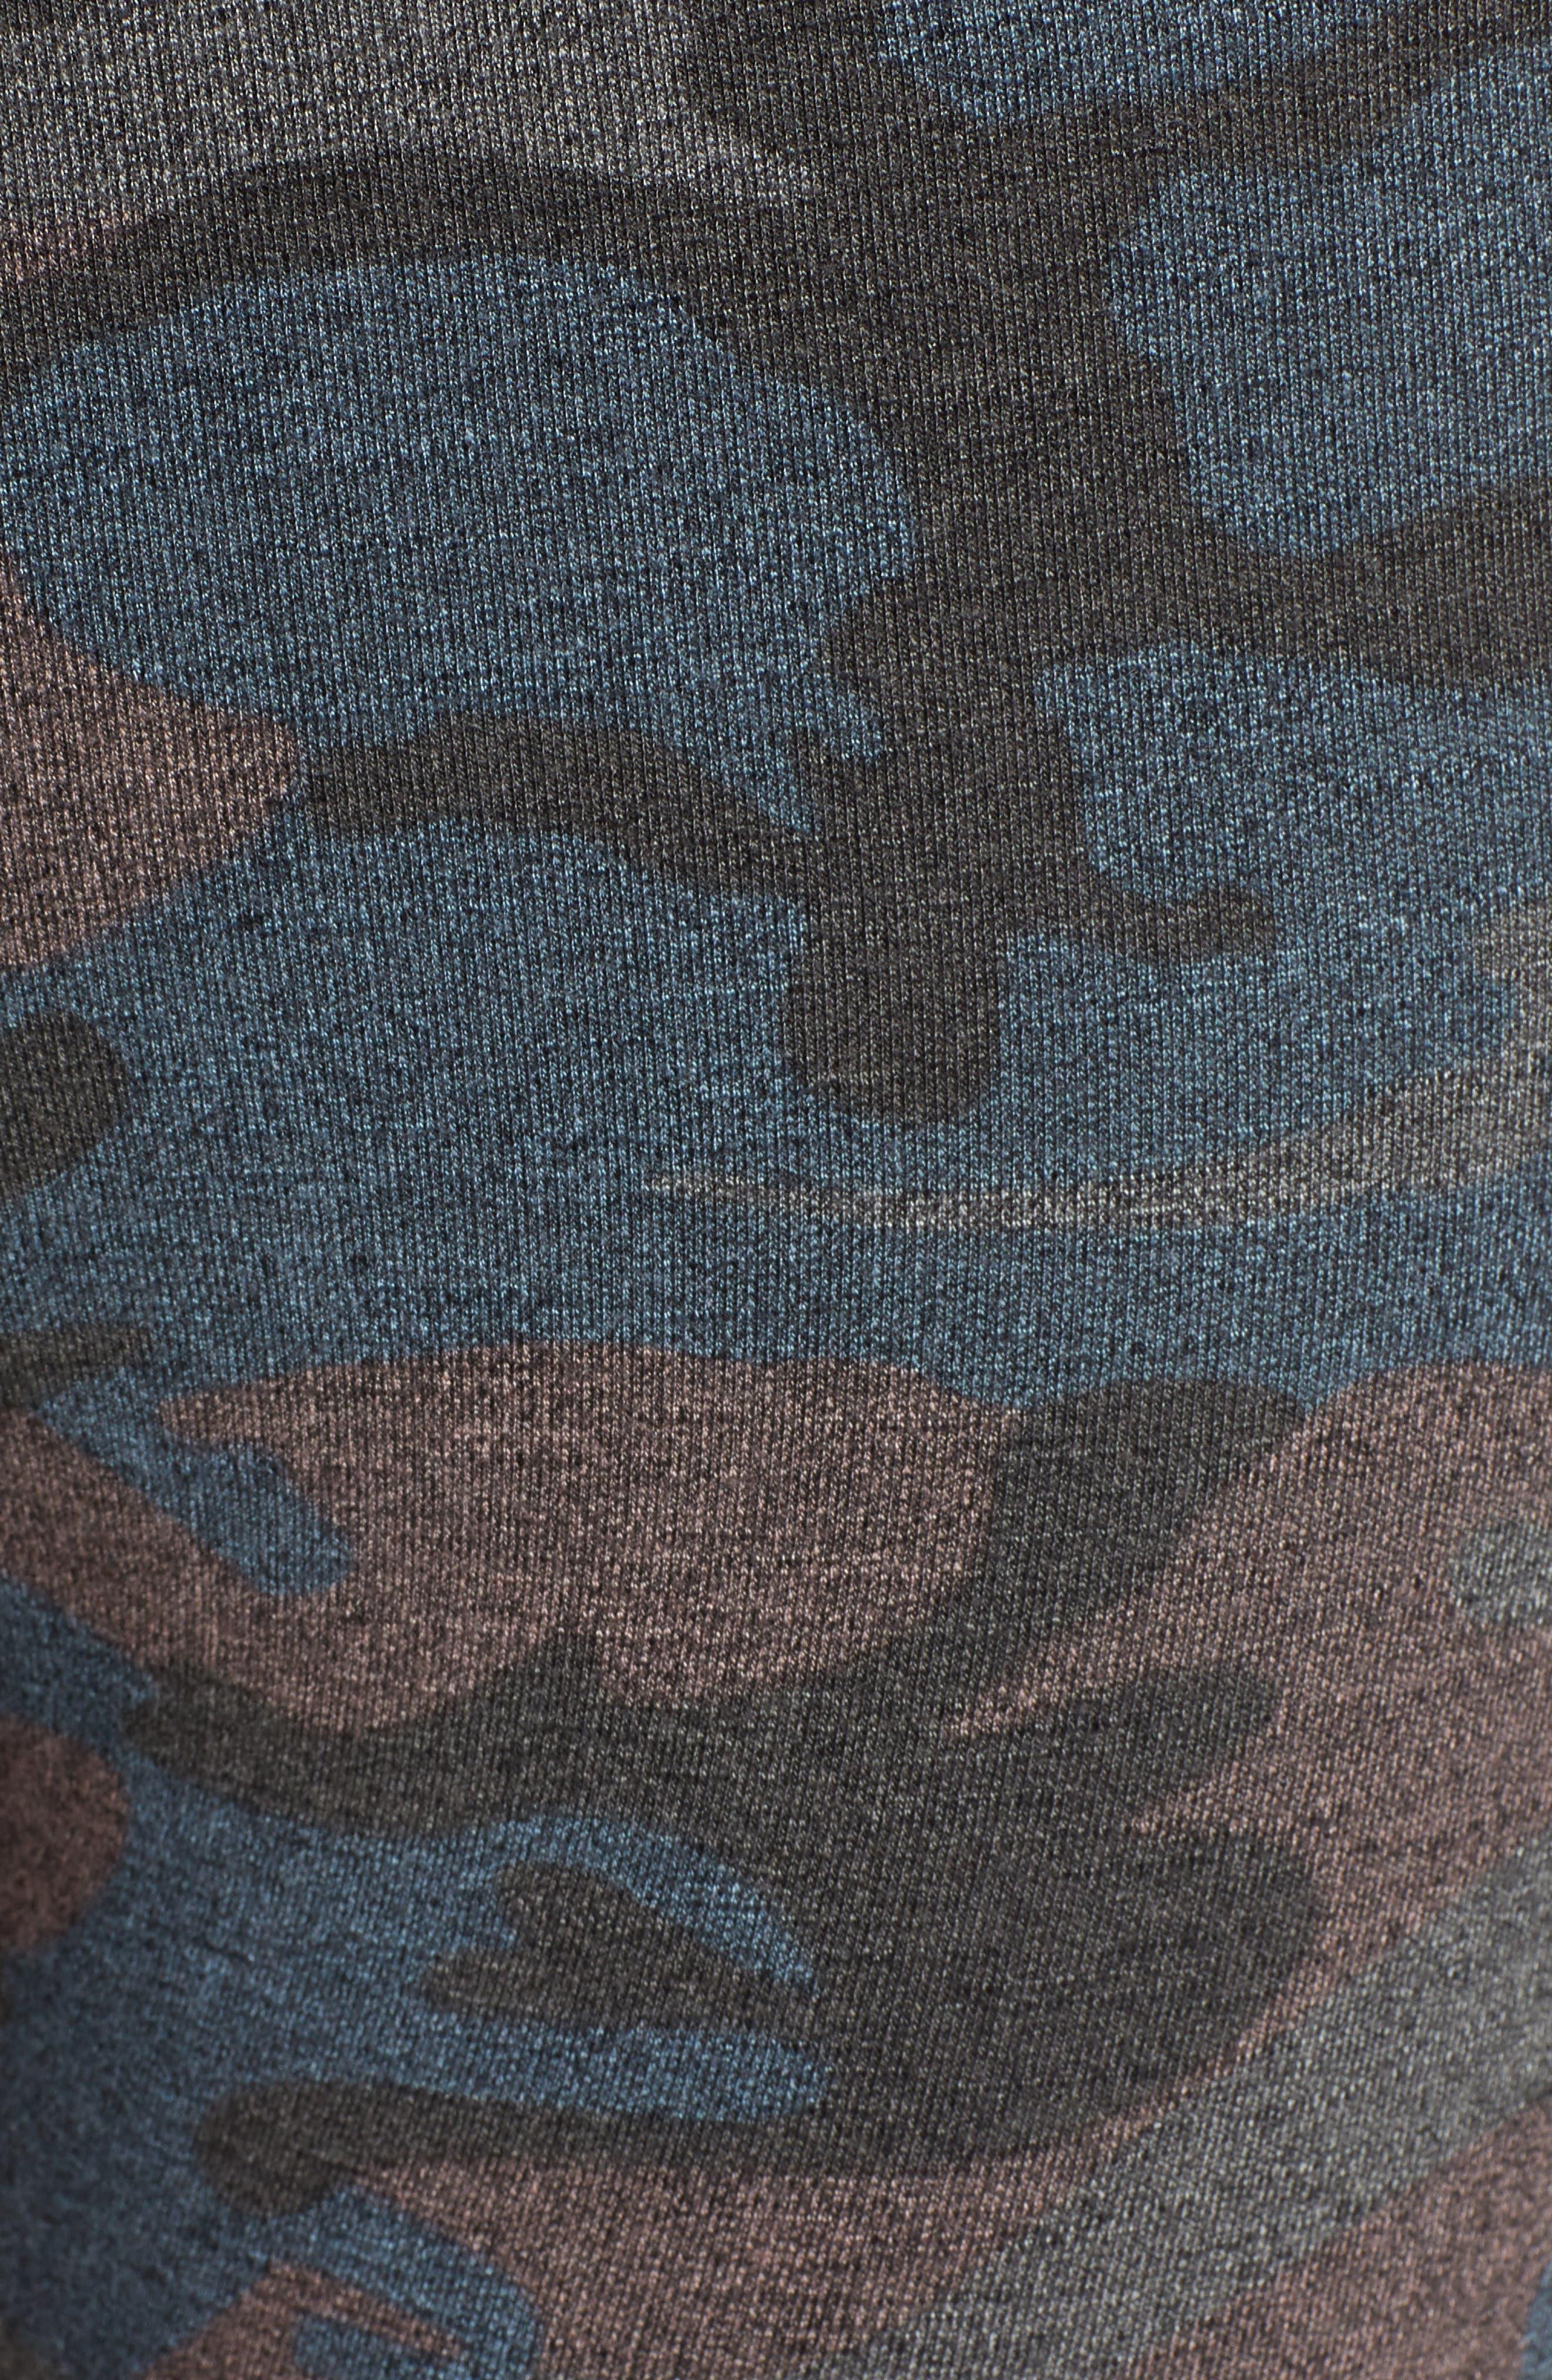 SUNDRY,                             Camo Yoga Pants,                             Alternate thumbnail 5, color,                             020